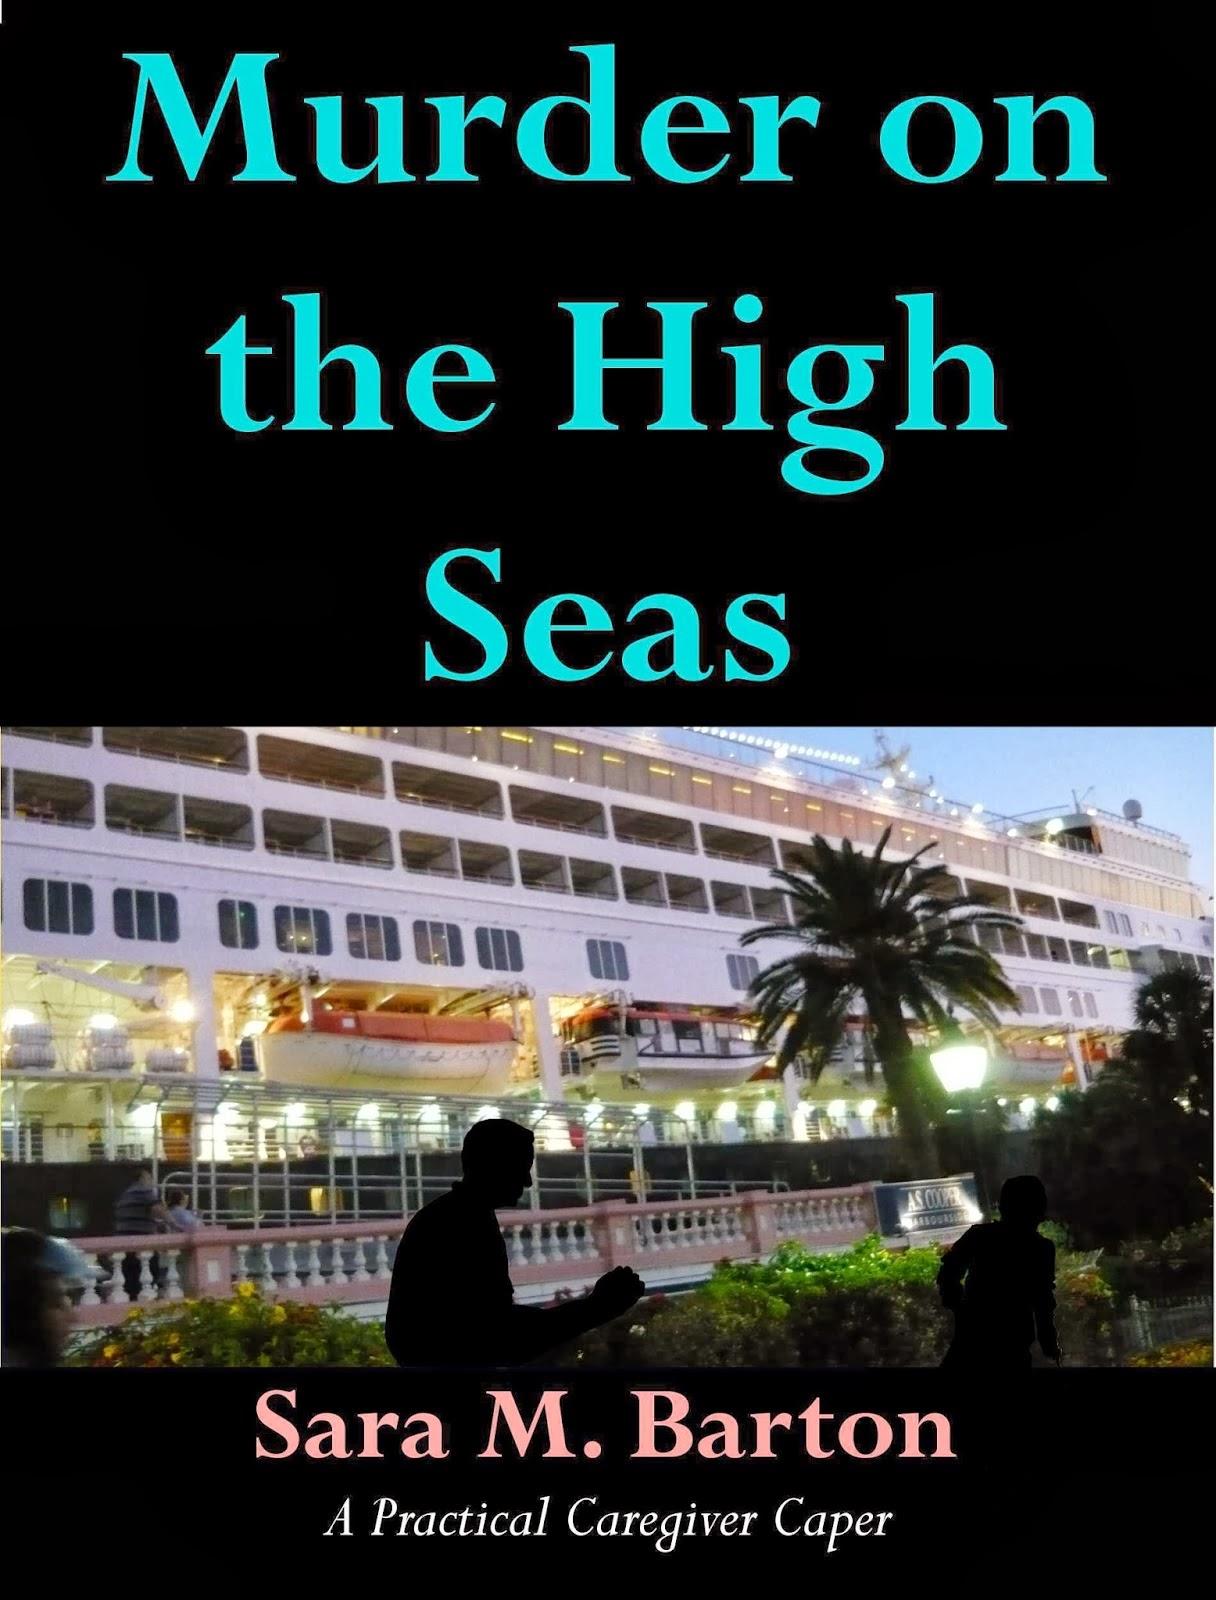 Murder on the High Seas by Sara M. Barton